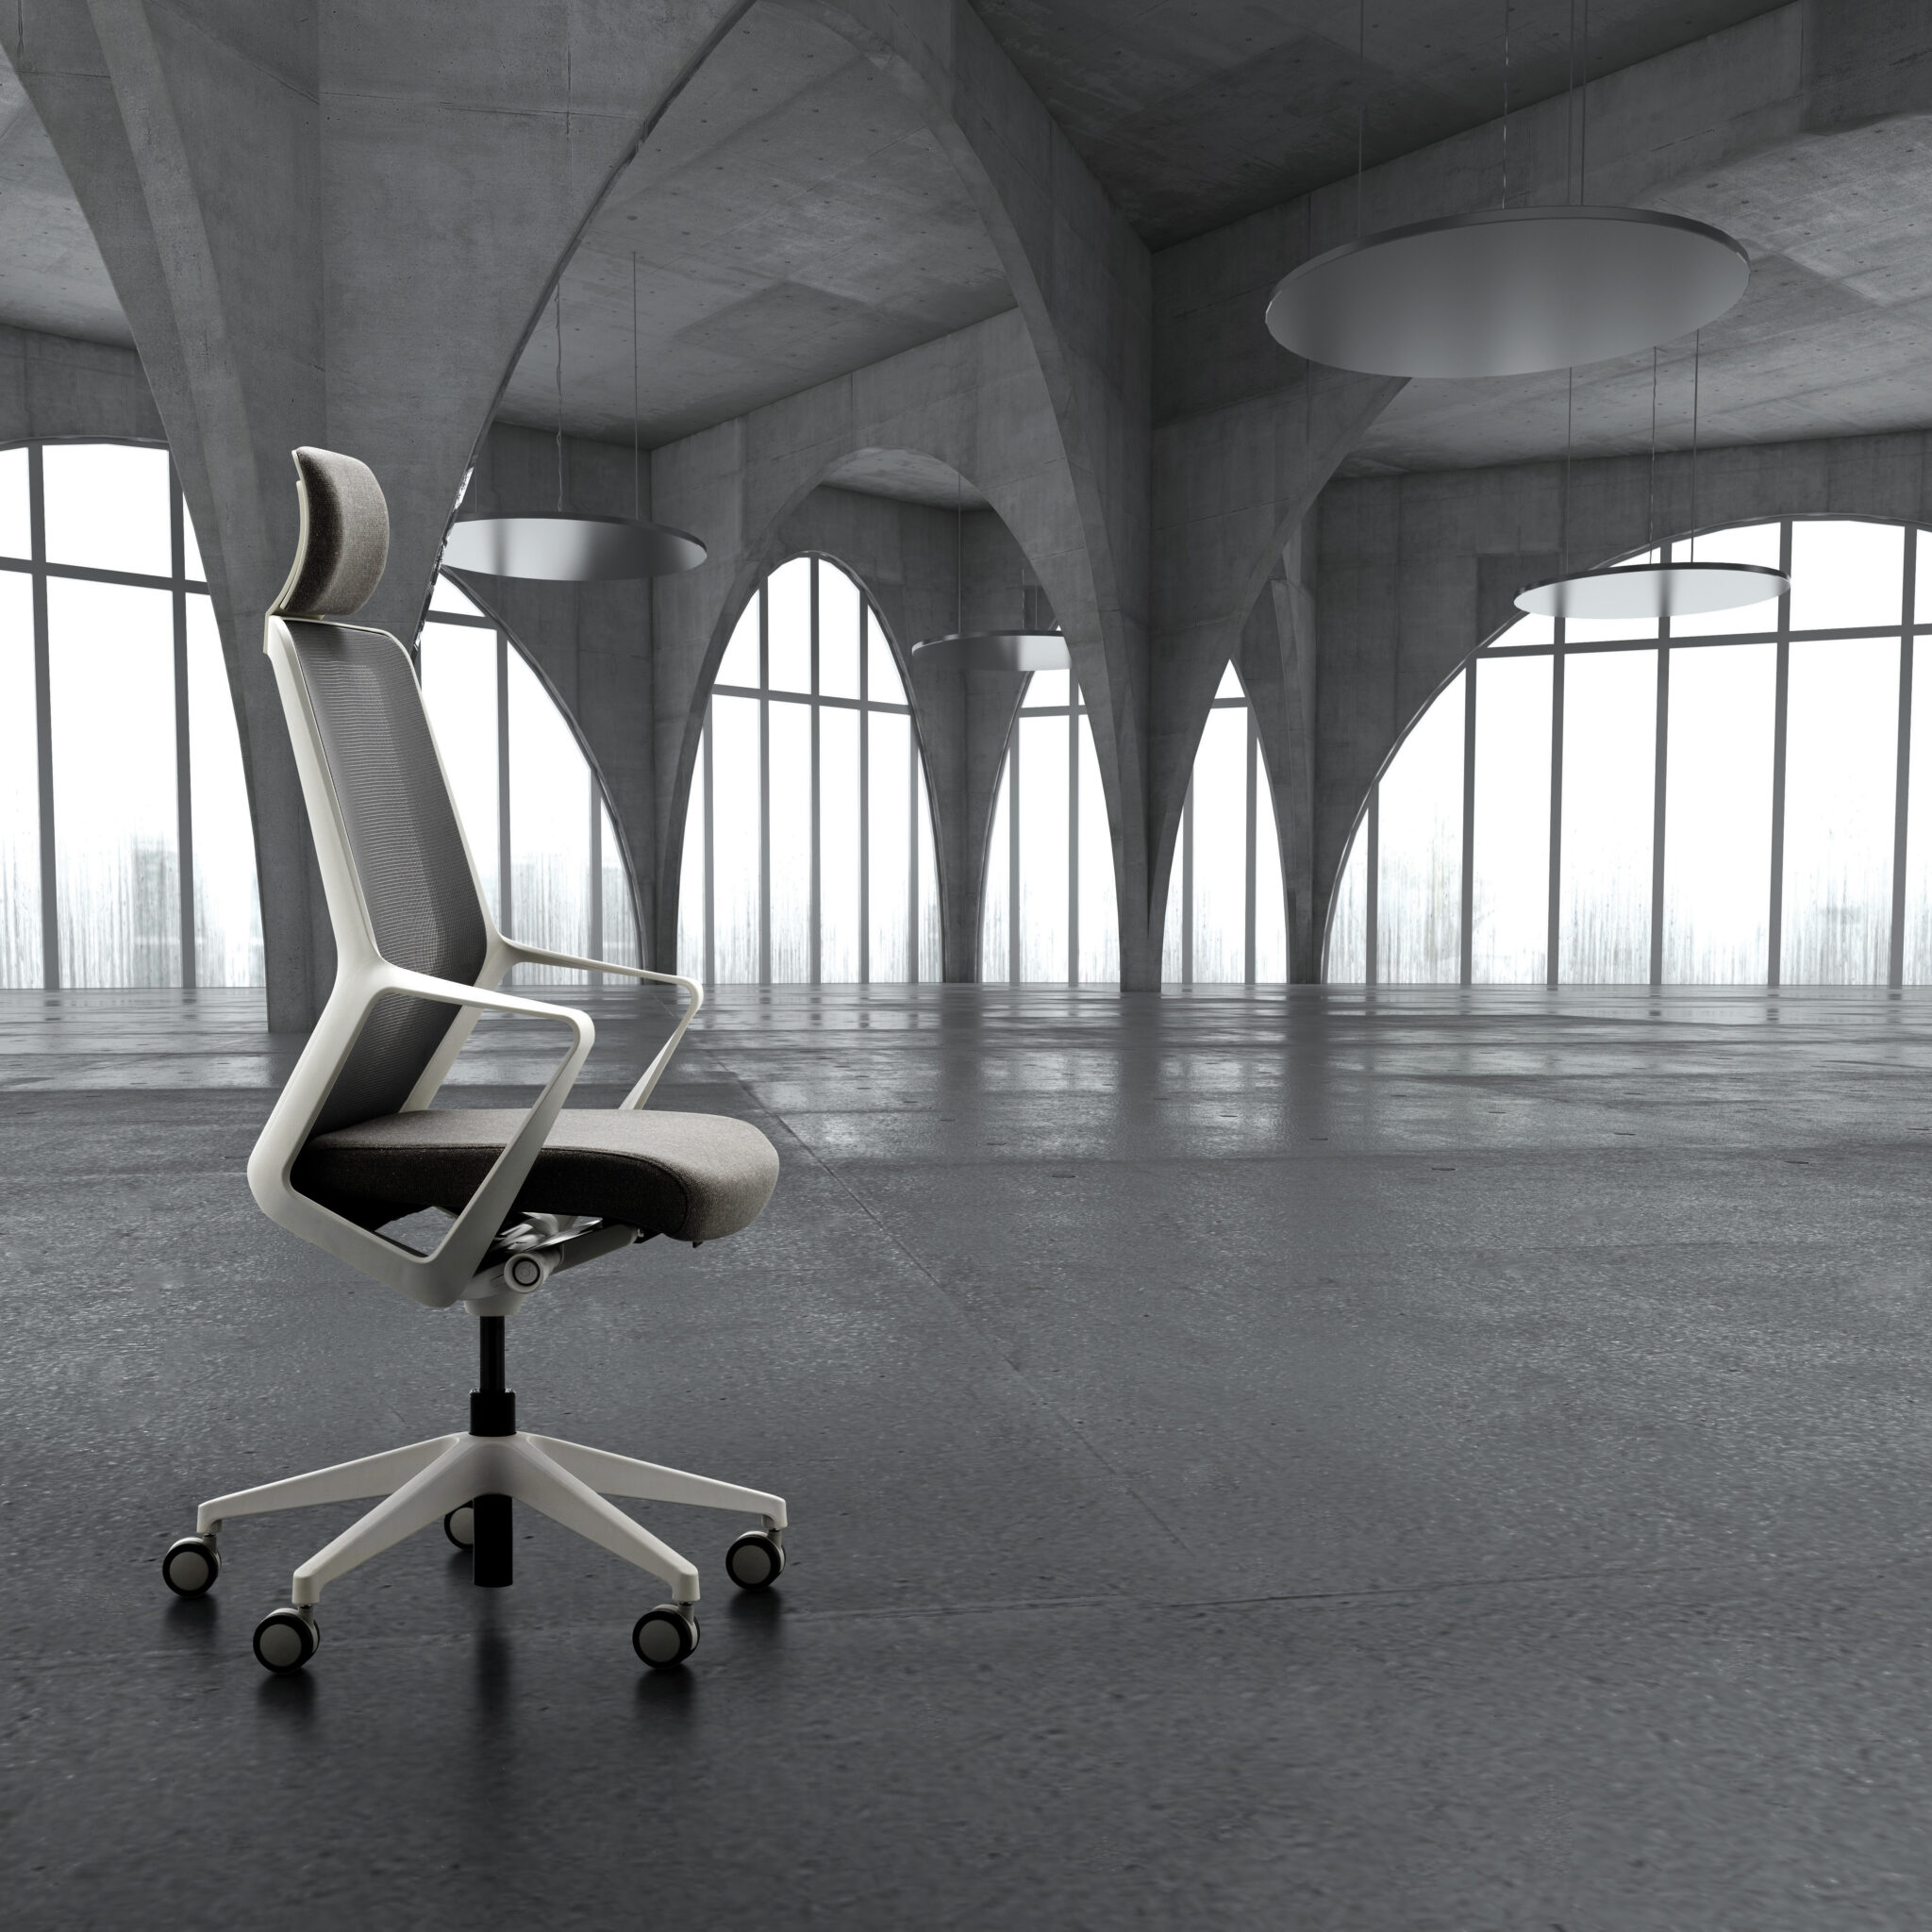 Diane Butterworth COVID-19 Office Space Task Chair Verco Office Furniture coronavirus